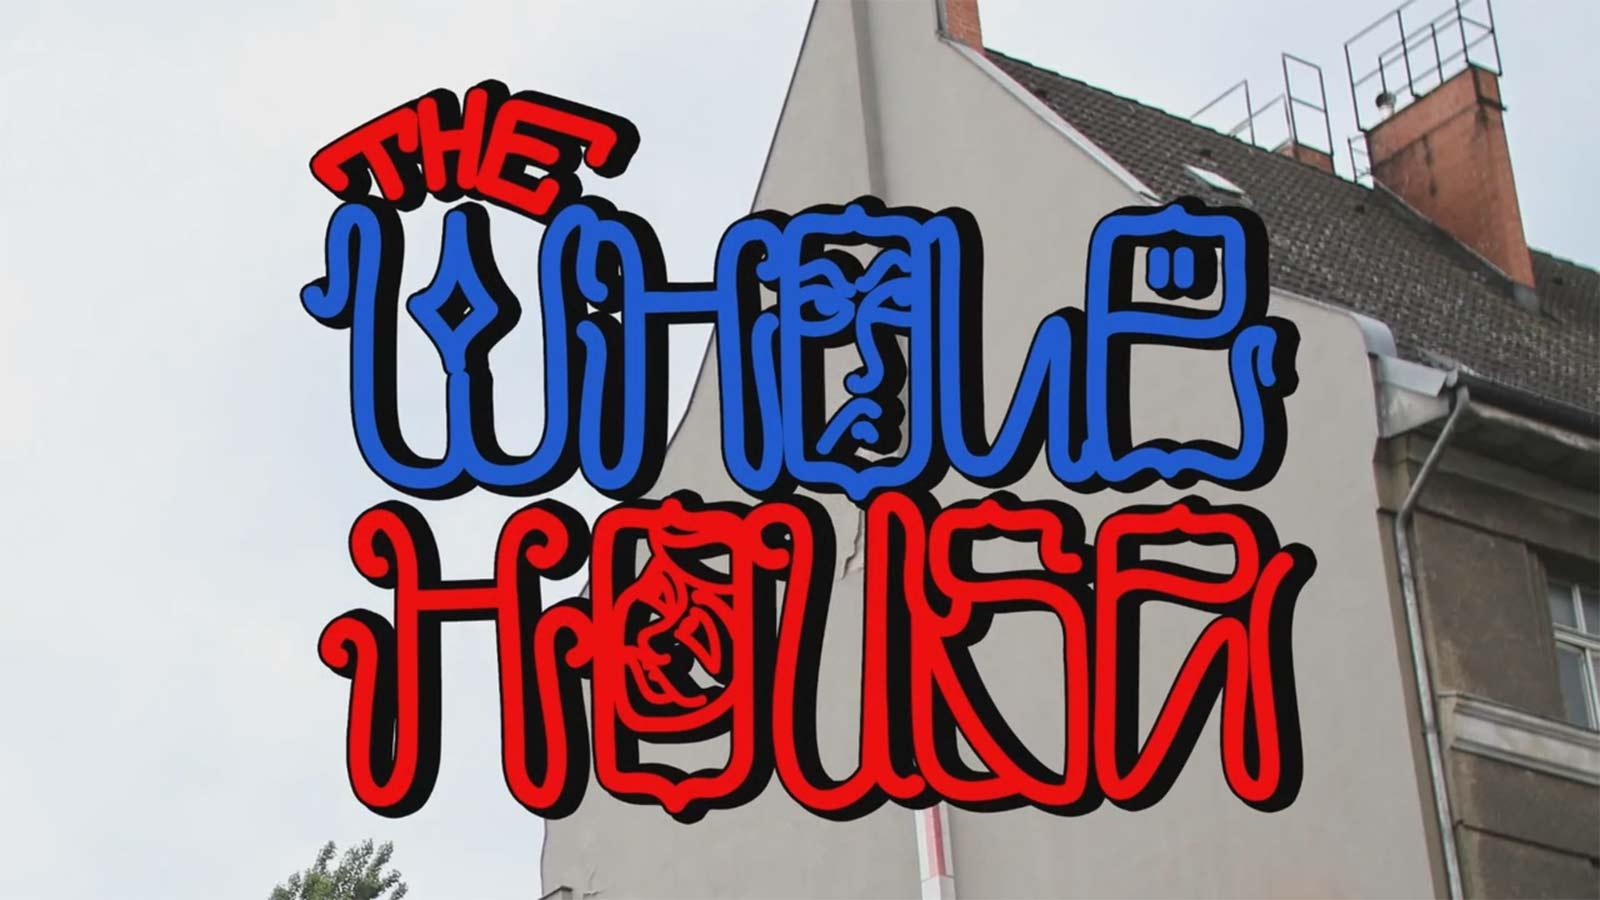 Berlin kidz the whole house berlin graffiti